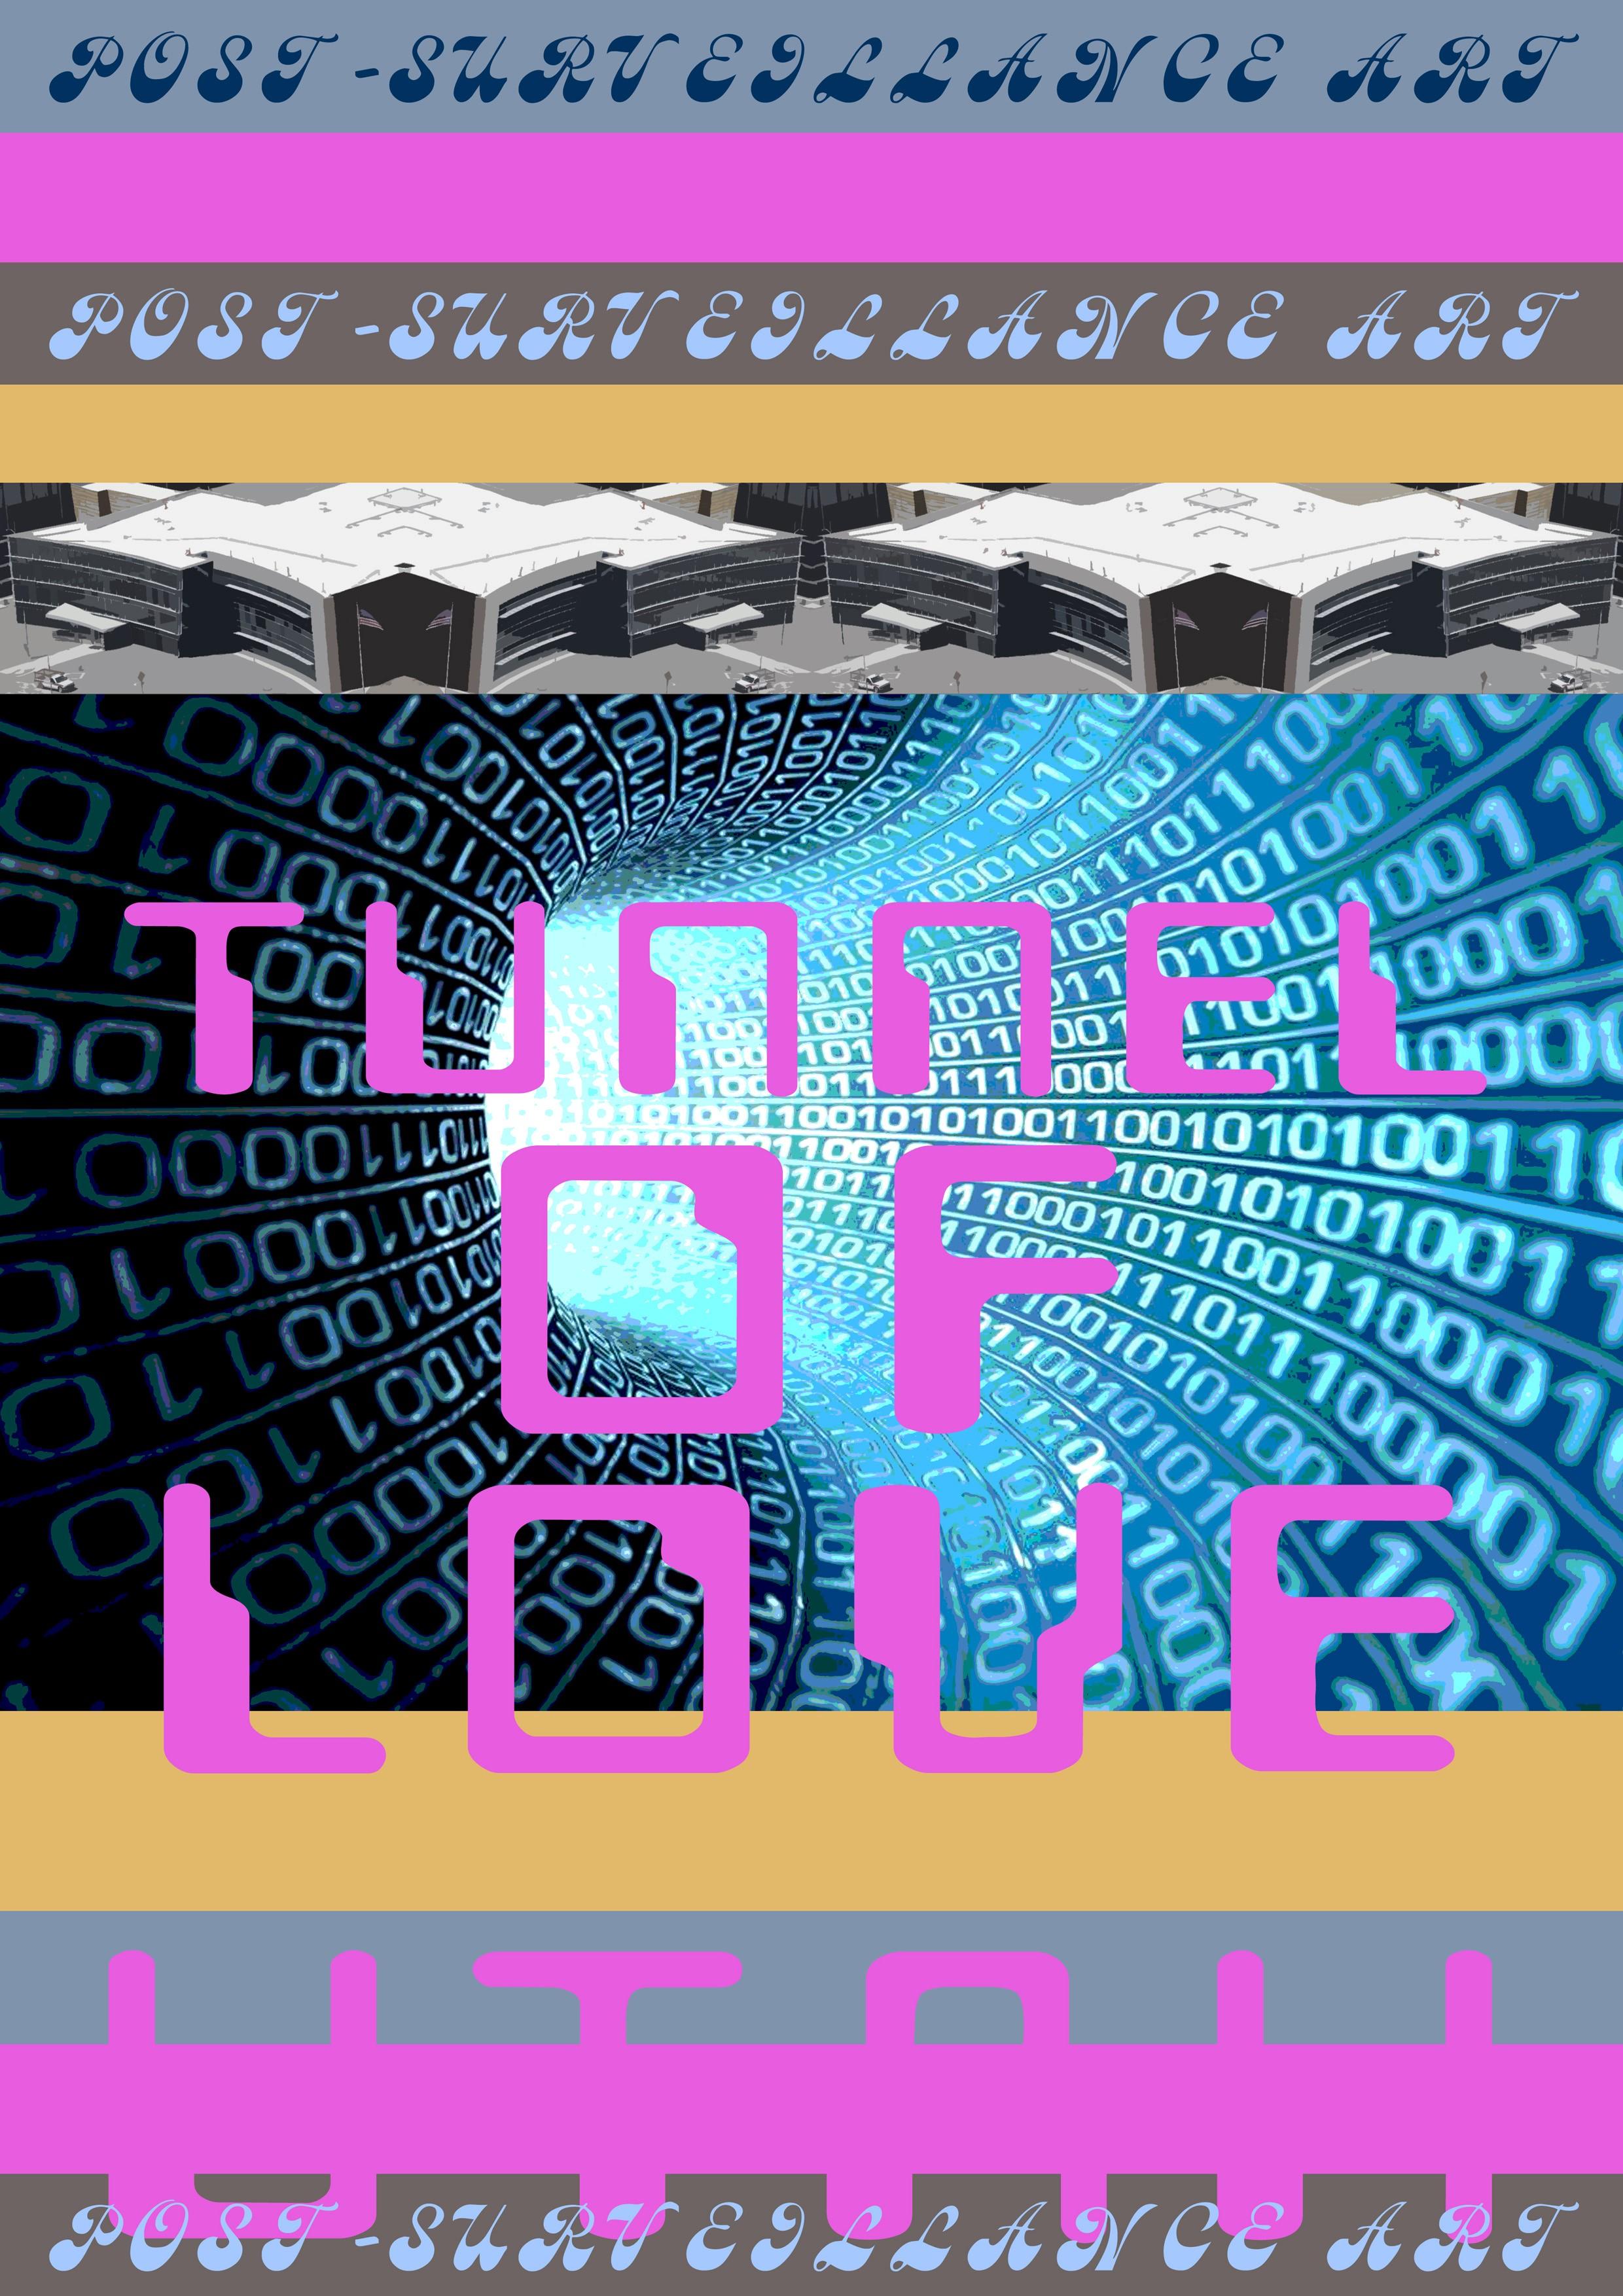 Suzanne Treister, Post-Surveillance Art/Tunnel of Love, 2014